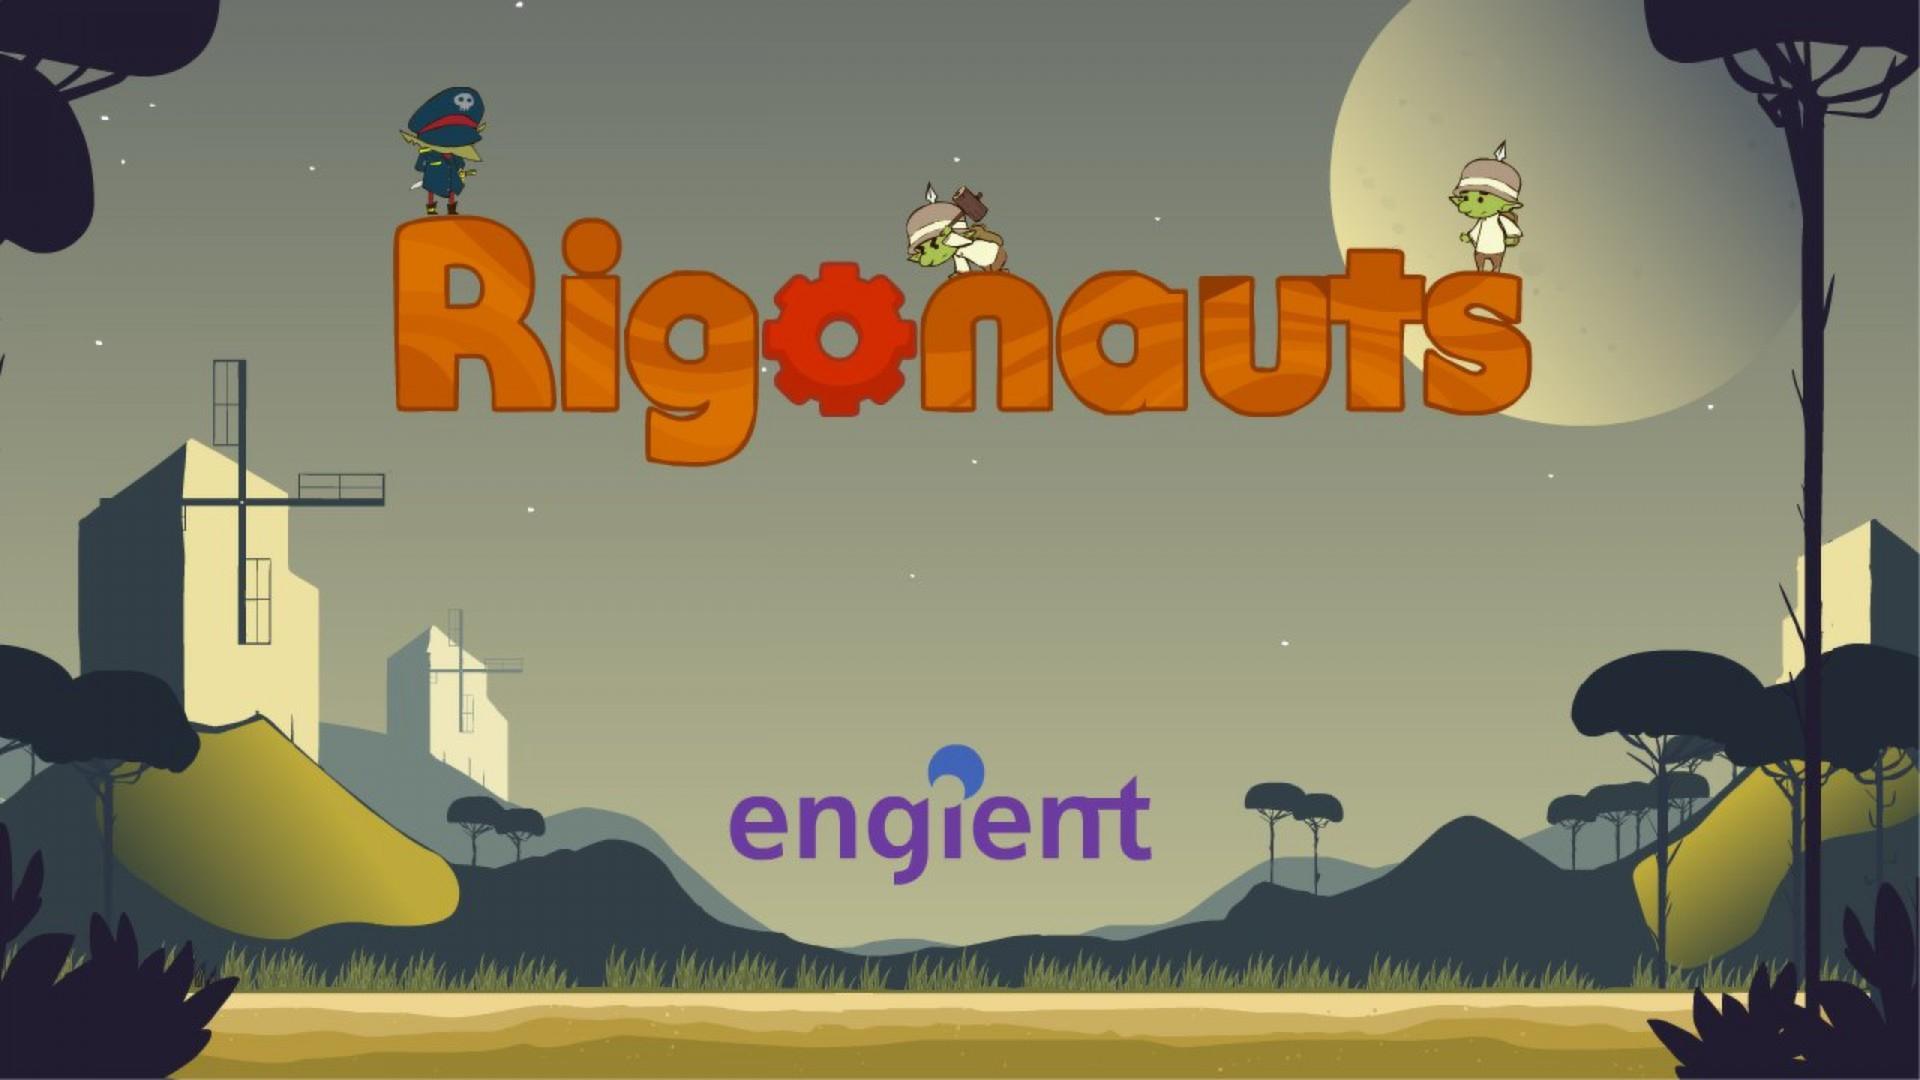 rigonauts feat